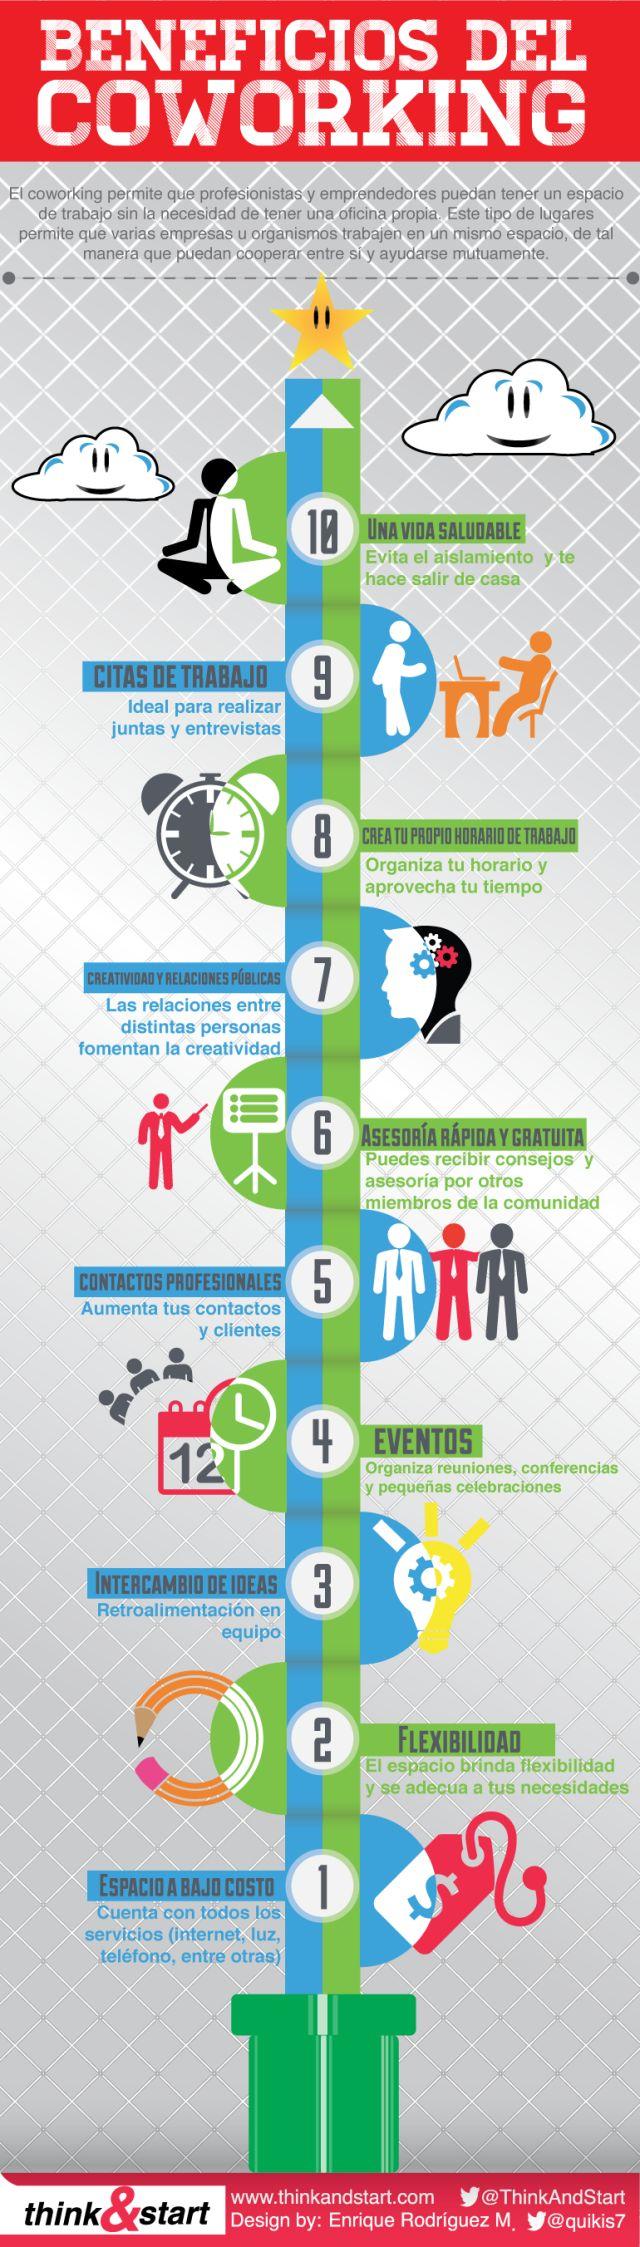 Beneficios del coworking #infografia #infographic #entrepreneurship